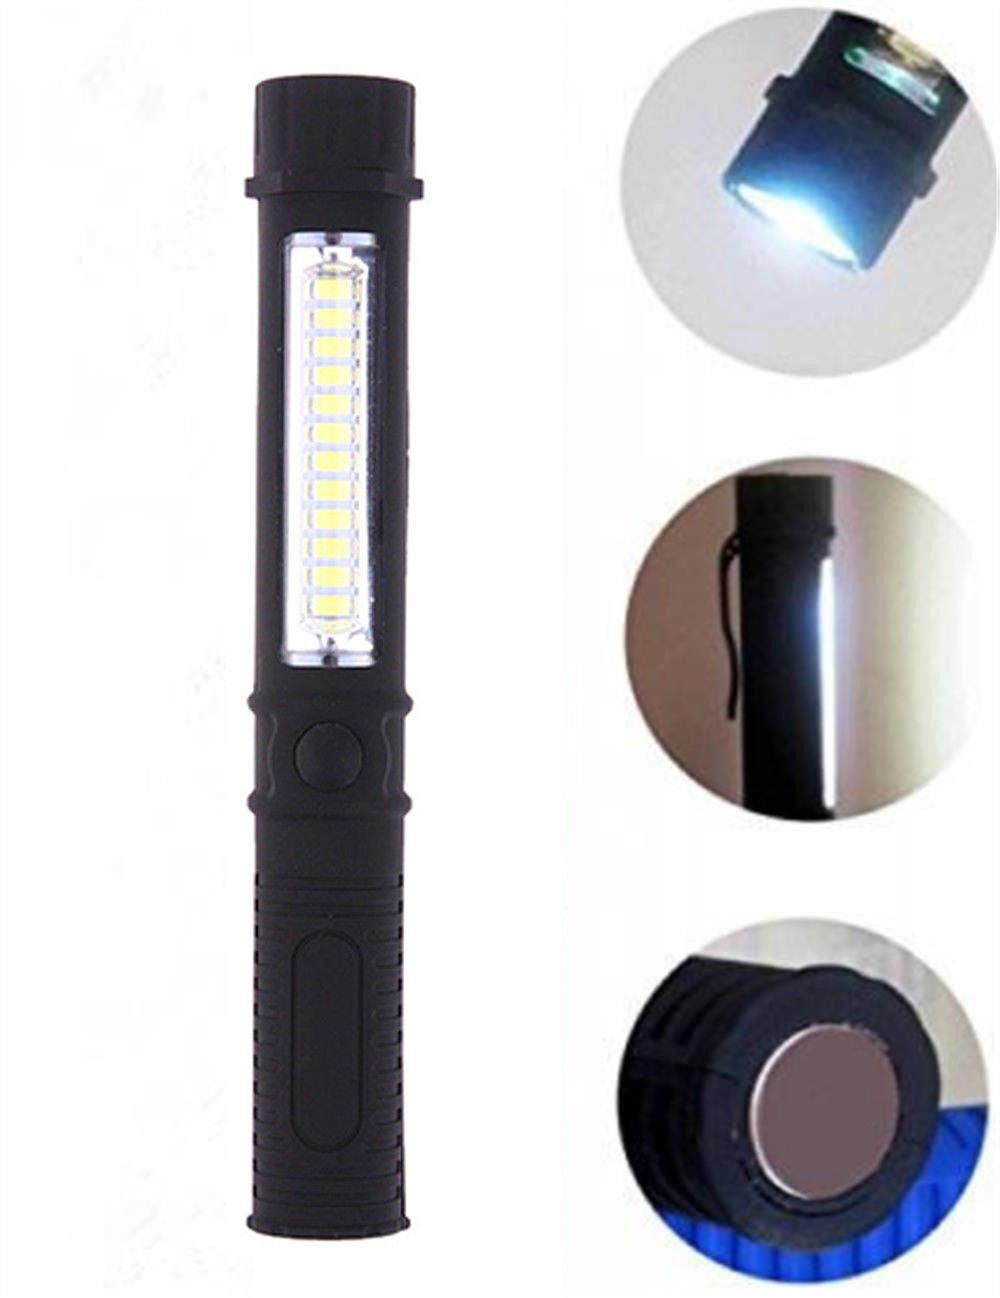 COB LED Pocket Pen Light Inspection Work Light Flashlight Torch With Clip